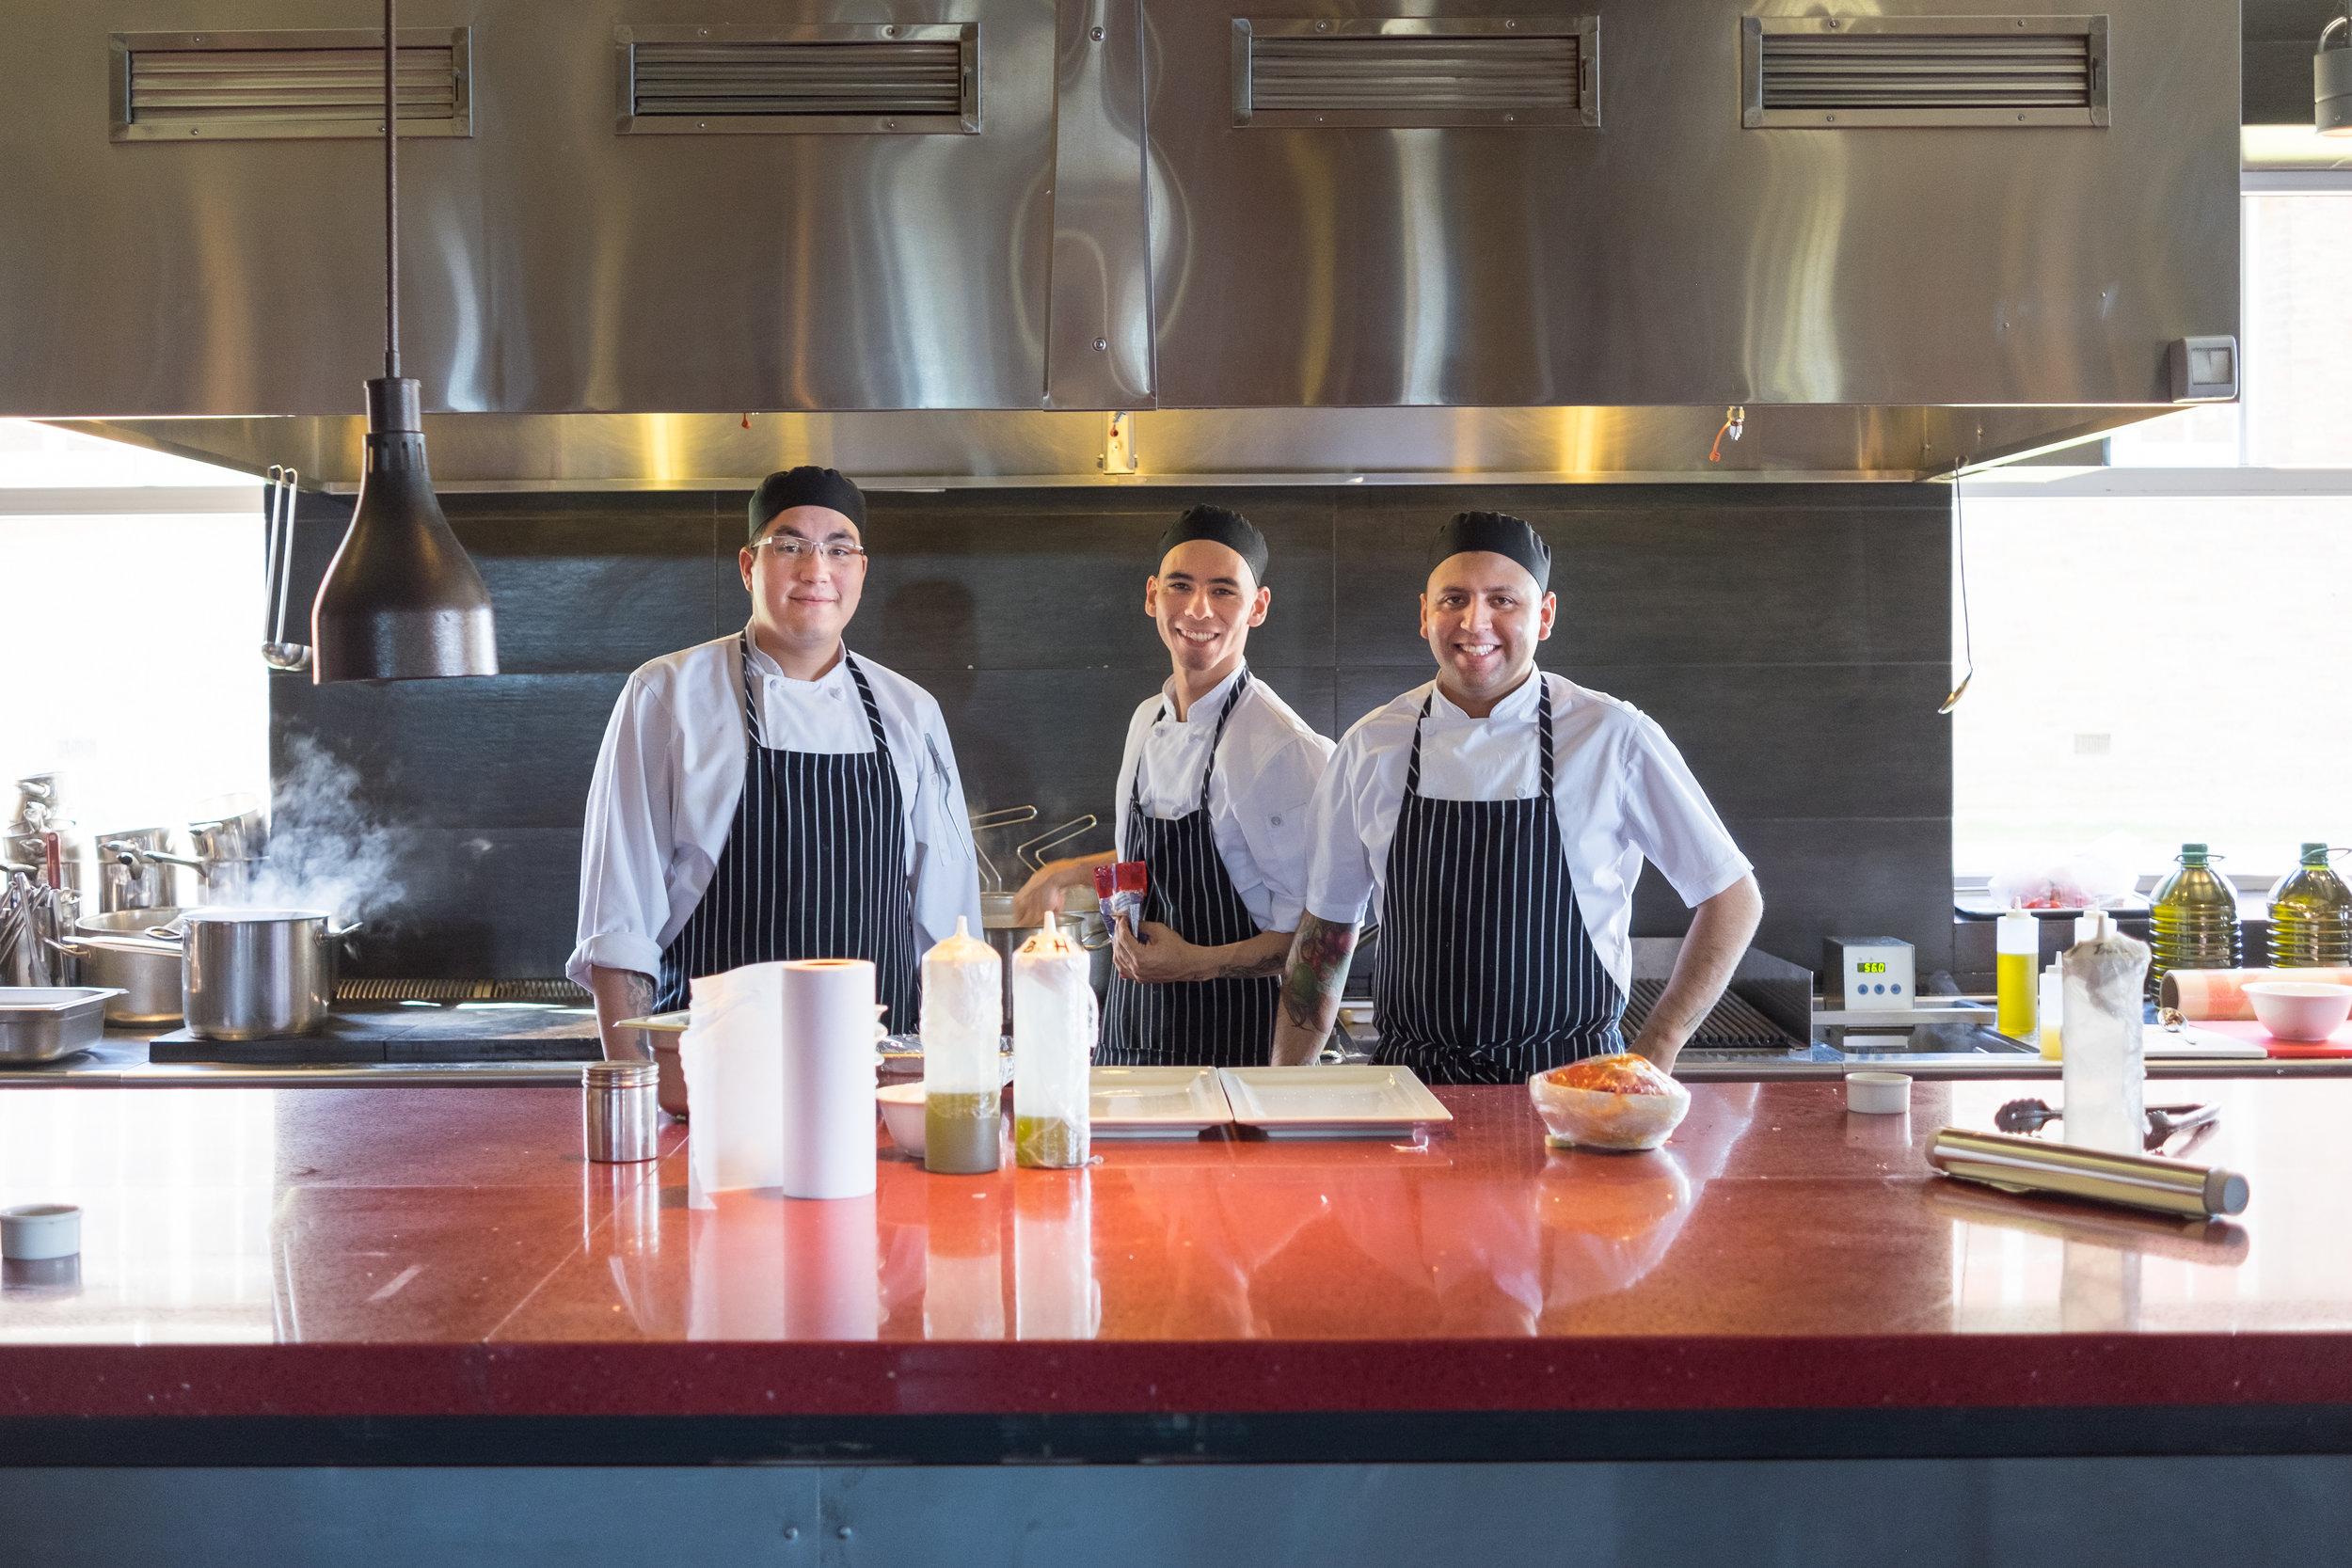 Friendly chefs at The Singular restaurant